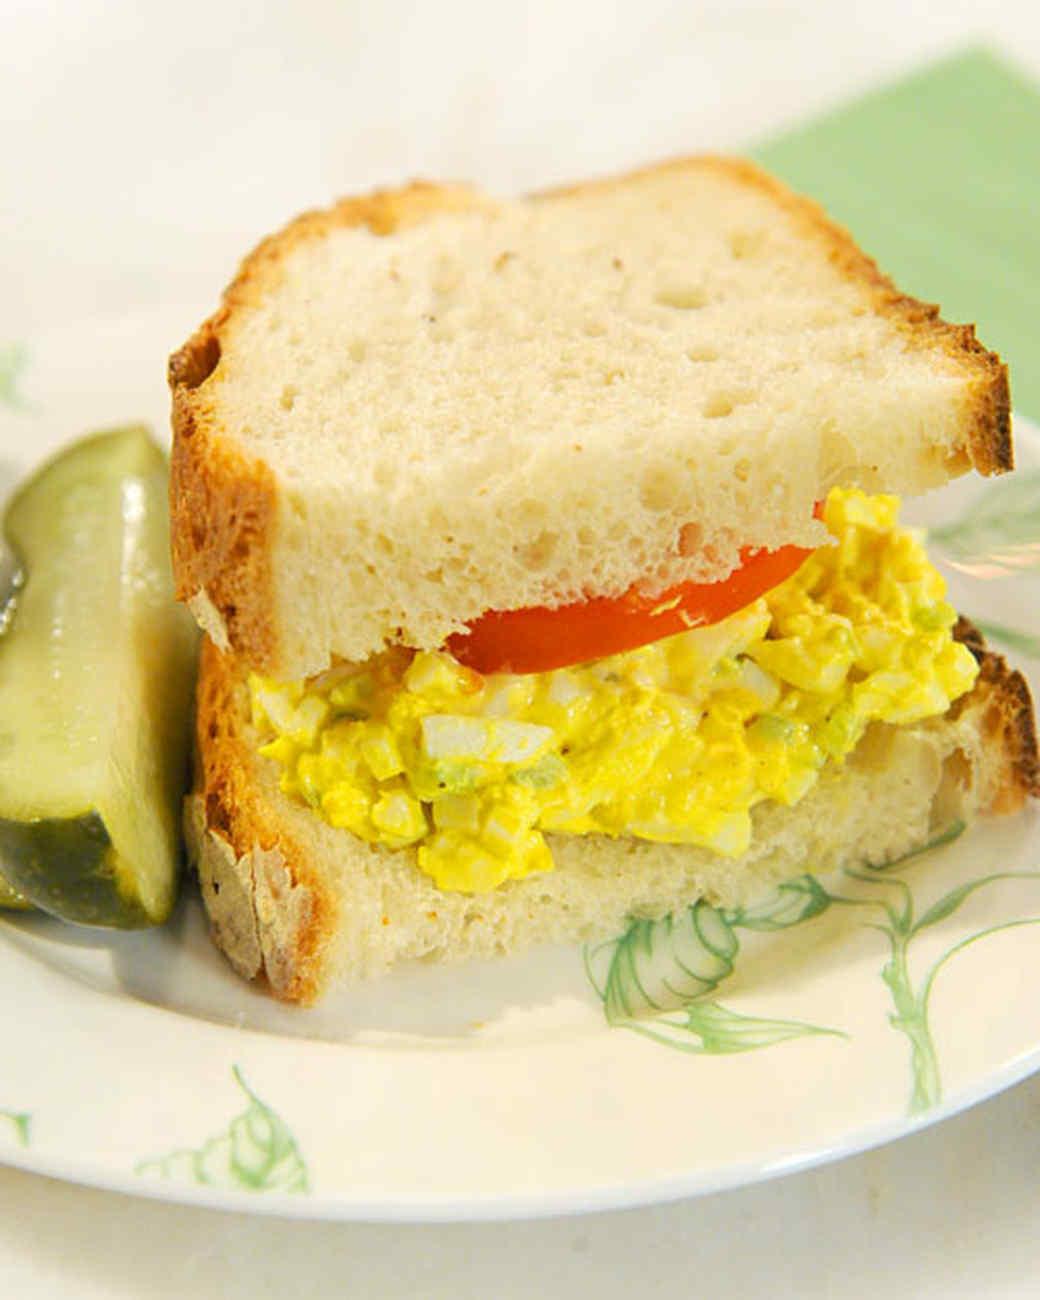 Mom's Egg Salad Sandwich